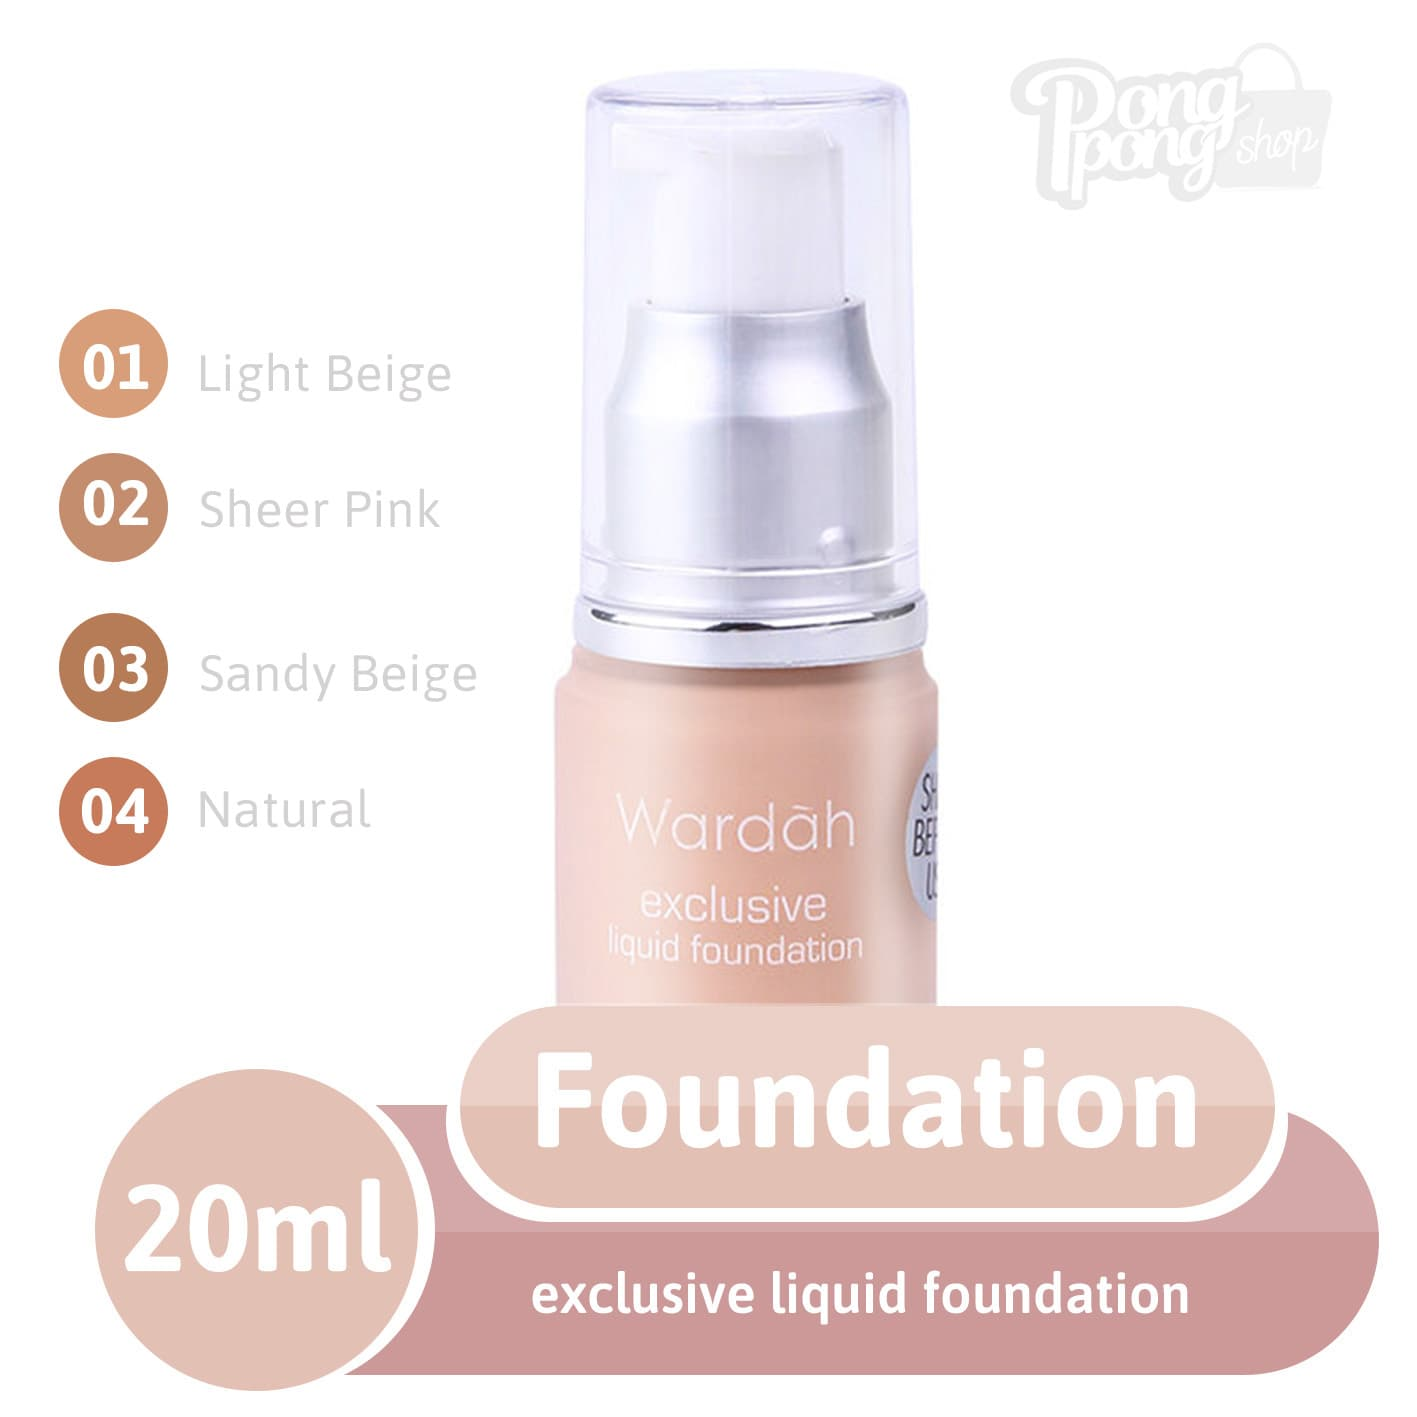 Jual Wardah Exclusive liquid foundation .